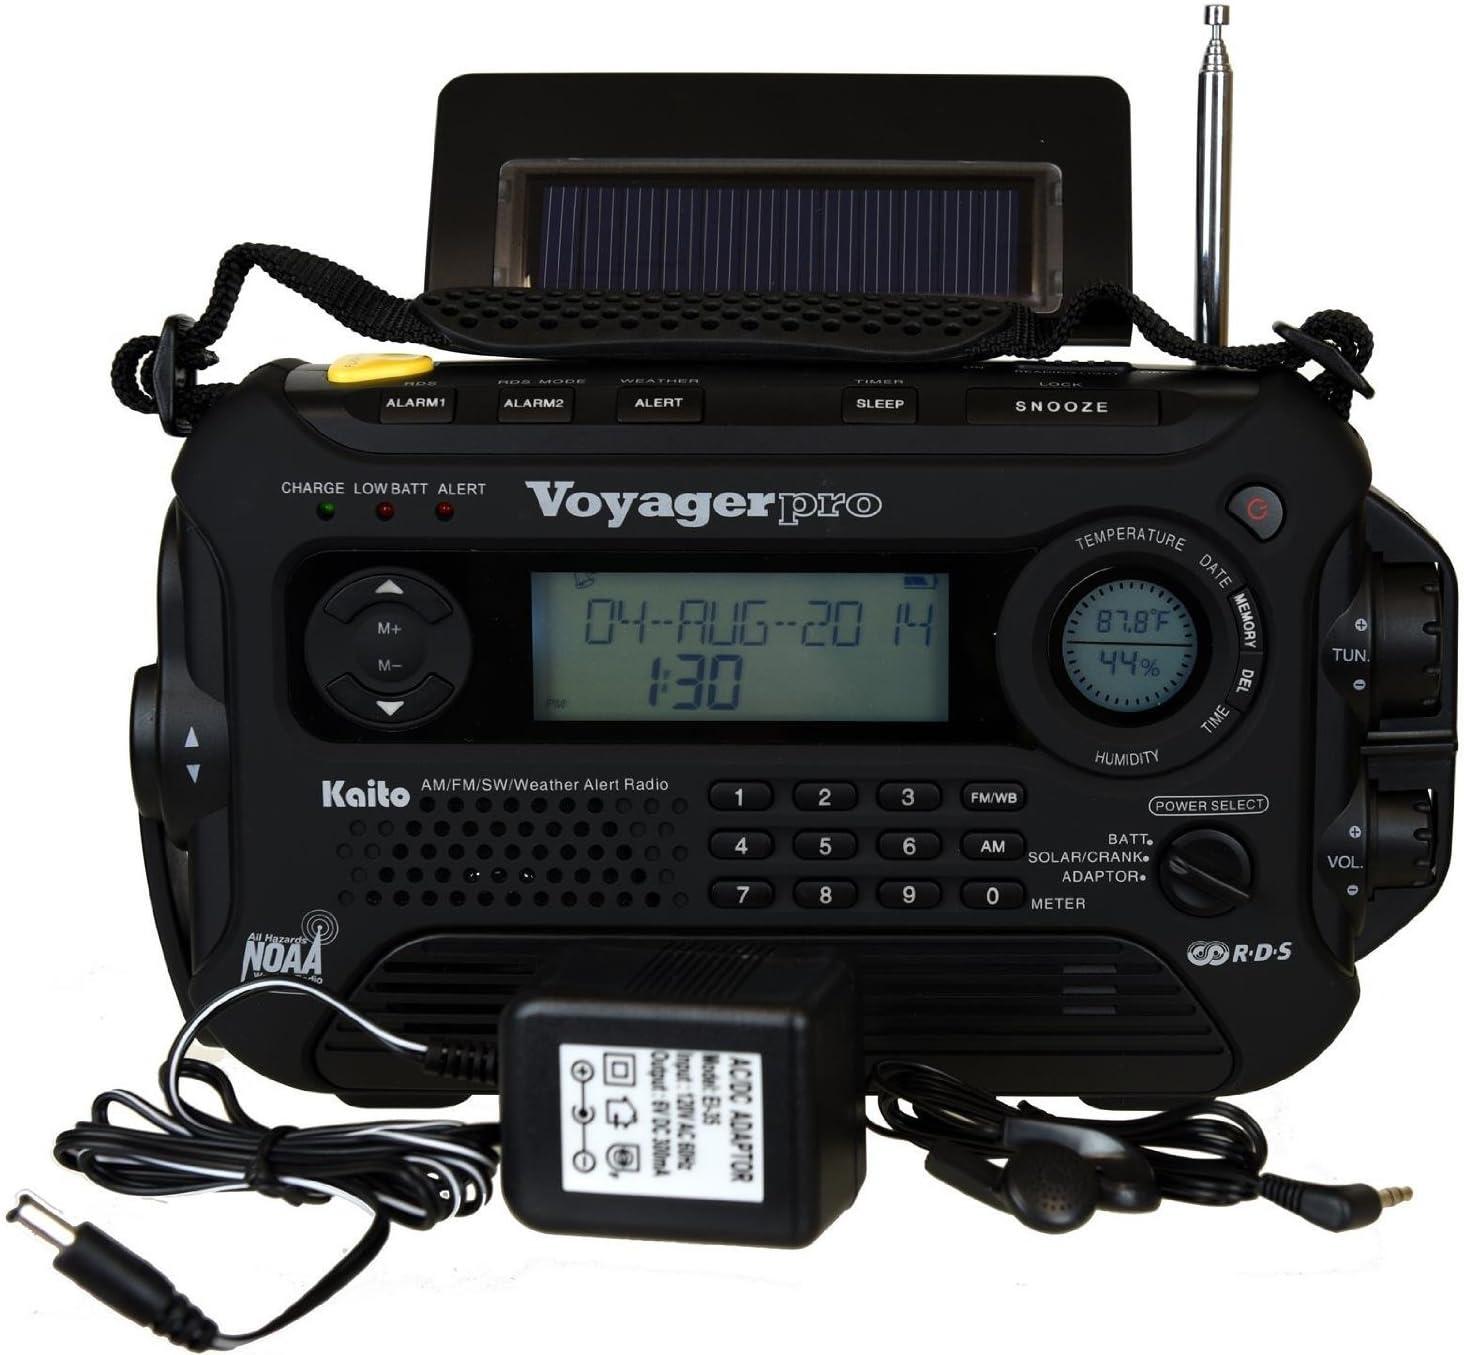 Kaito Voyager Pro KA600 Survival radio communications systems